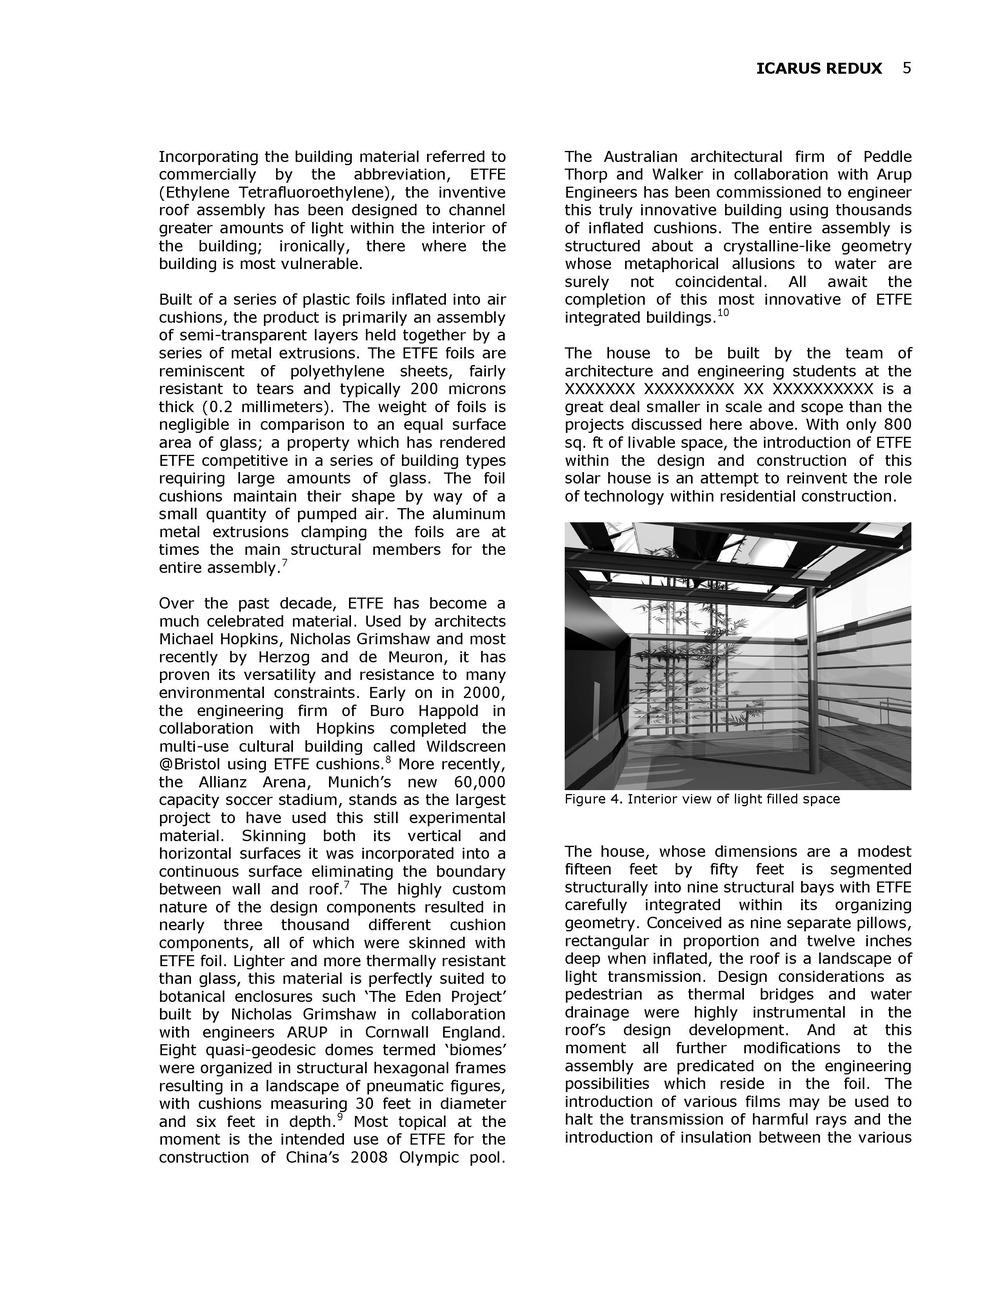 ACSA.2007.IcarusRedux_Page_5.jpg